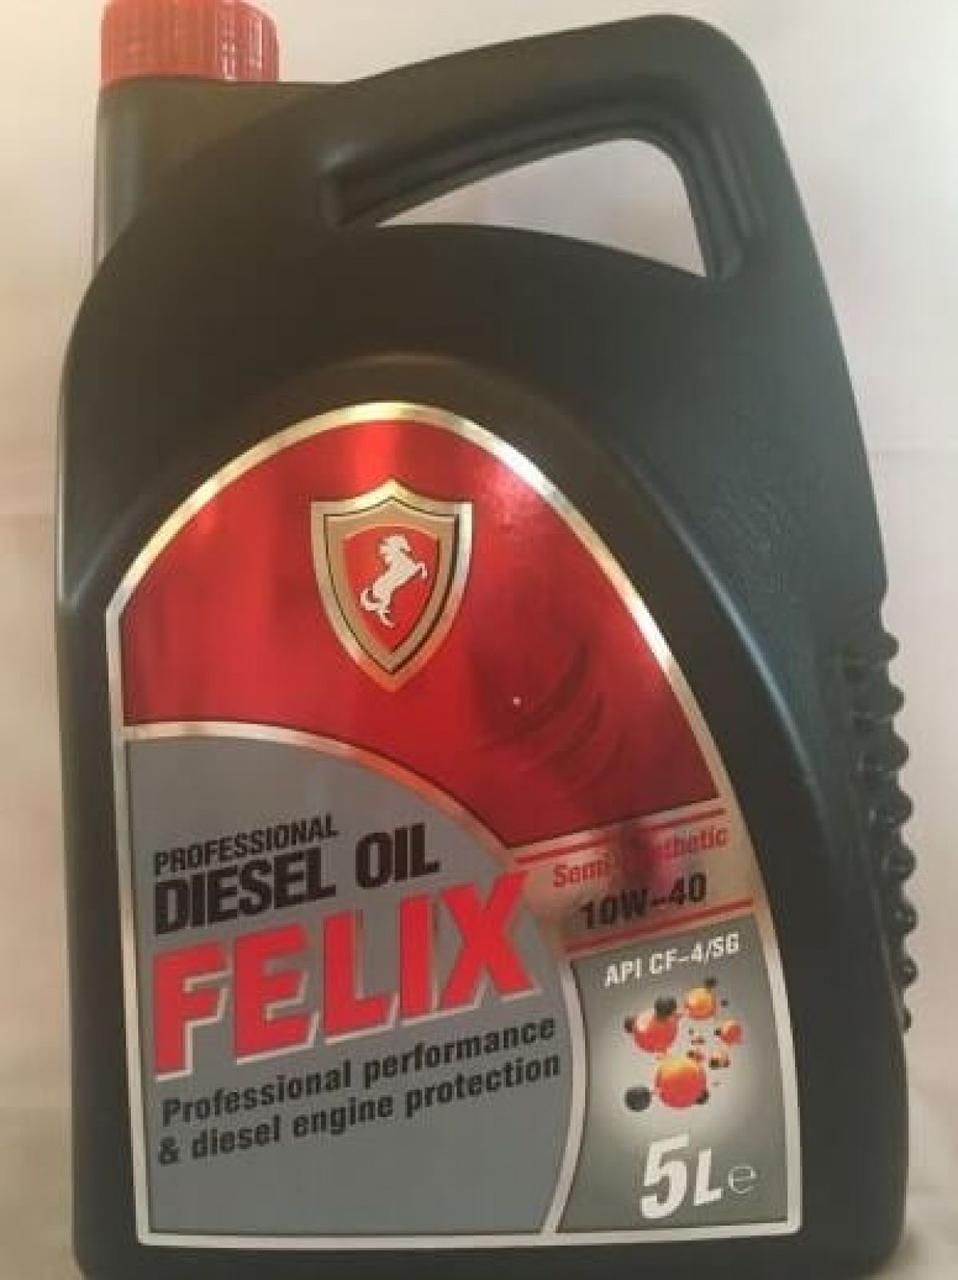 Масло моторное Professional diesel oil FELIX 10W-40 API CF-4/SG 5л (430900025)